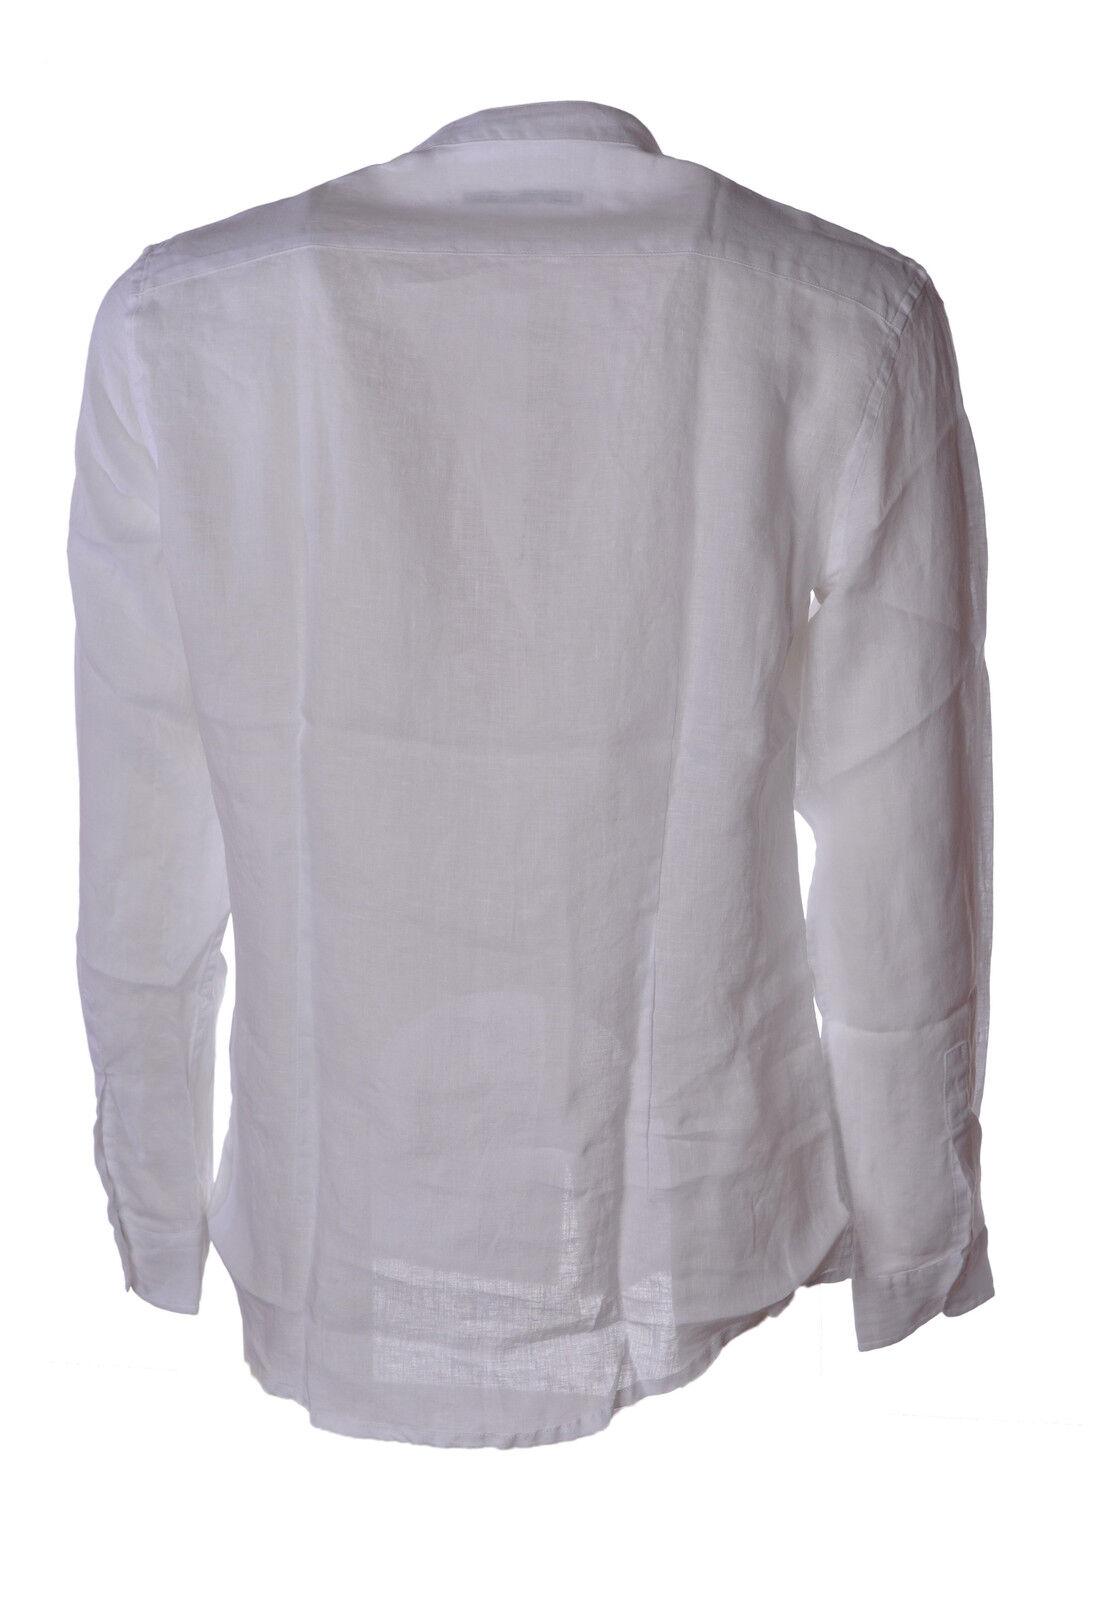 Daniele Alessandrini  -  Weiß Hemden - Männchen - Weiß  - 3124513A183616 2a3343